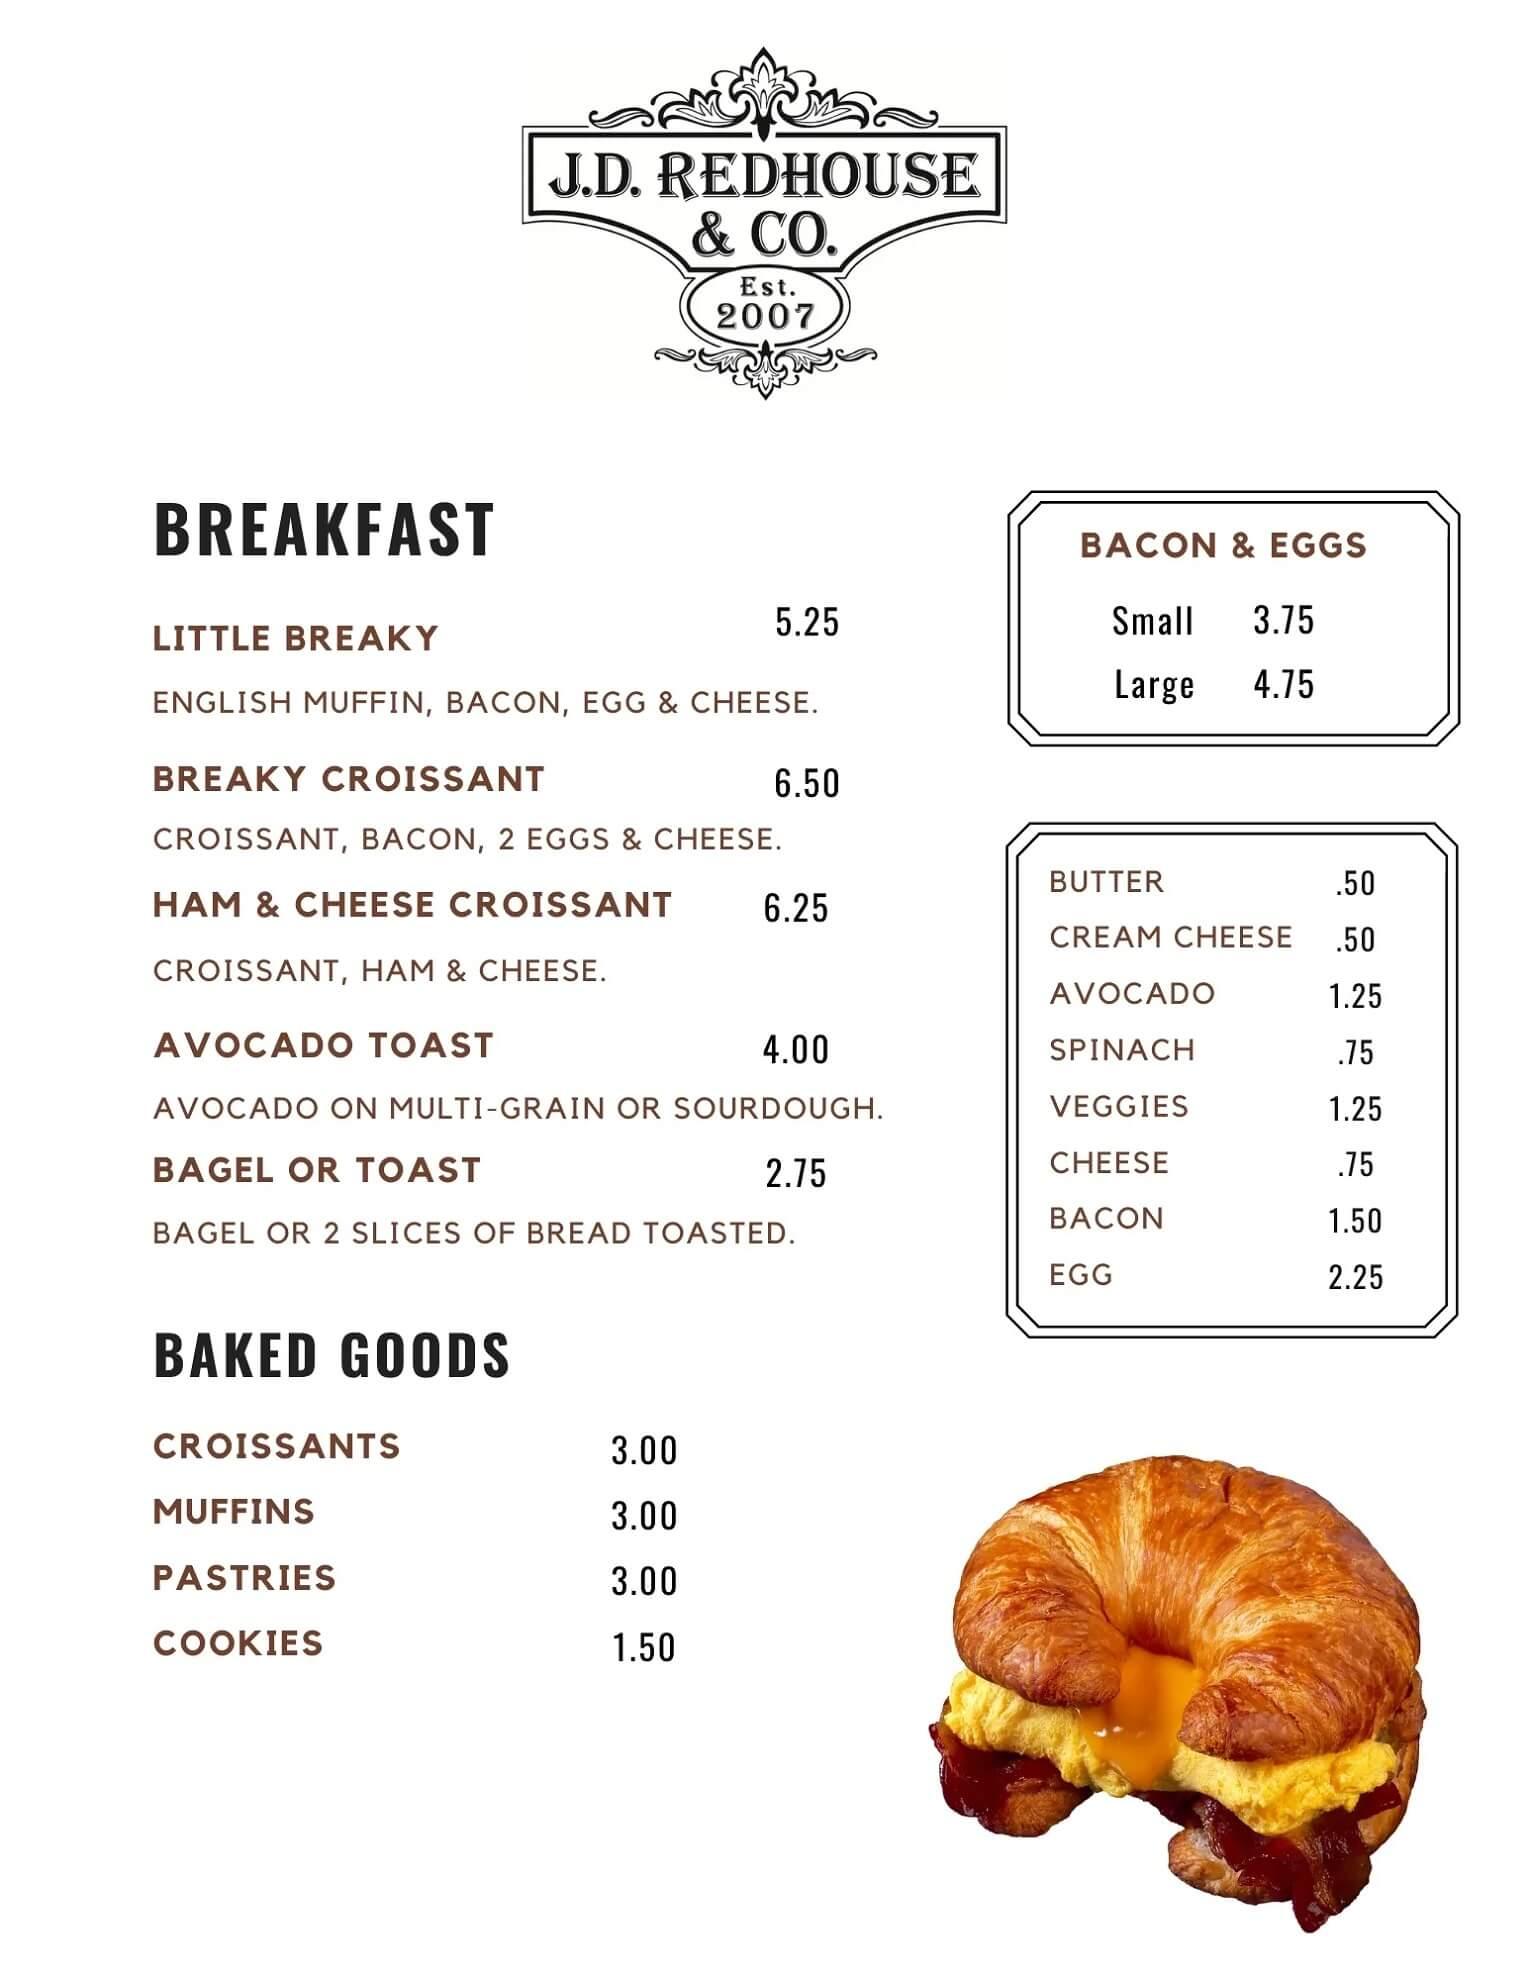 JD Redhouse Breakfast Menu - Willits California